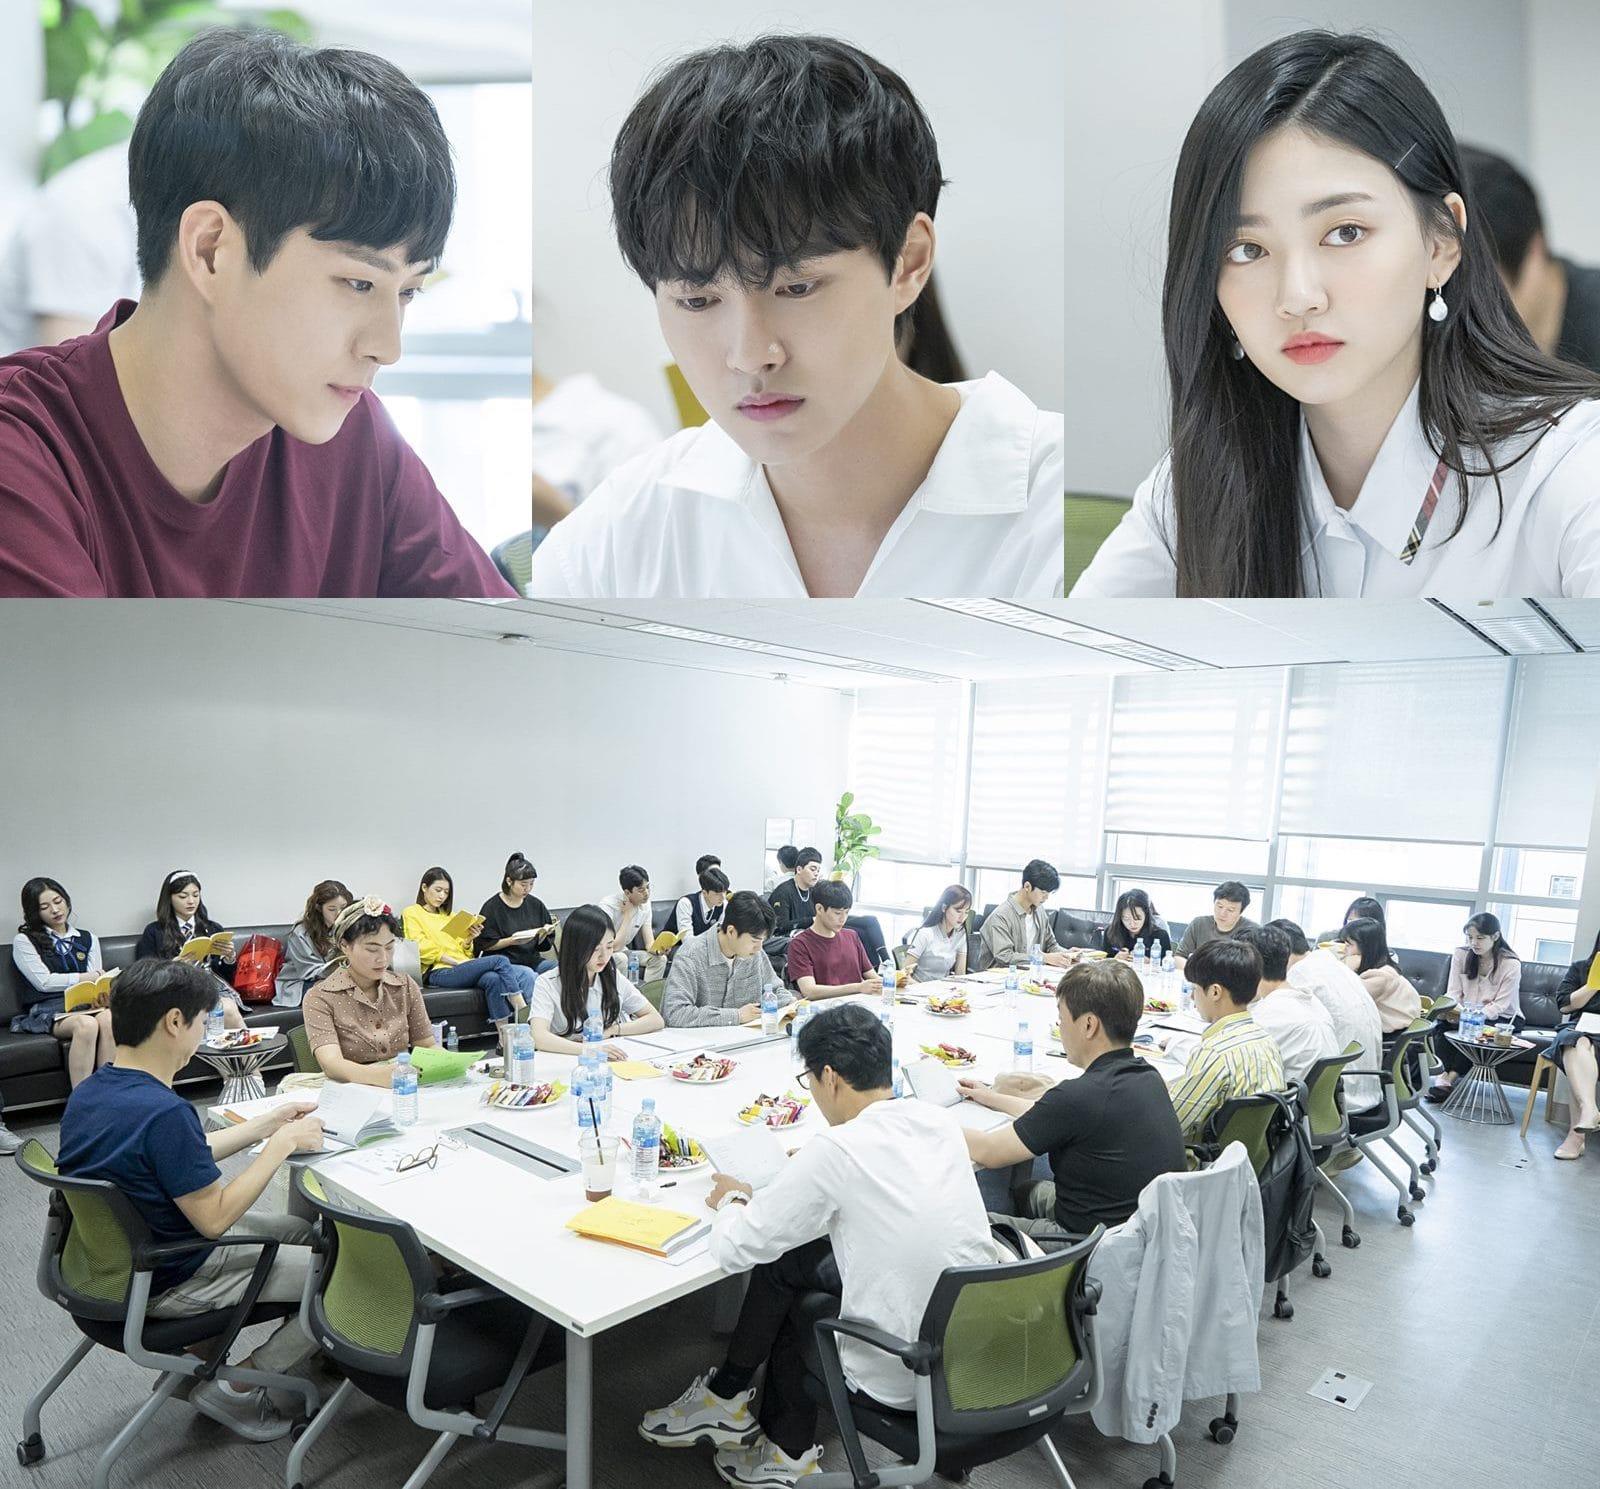 SF9's Rowoon, Kim Hye Yoon, APRIL's Naeun, And More Hold